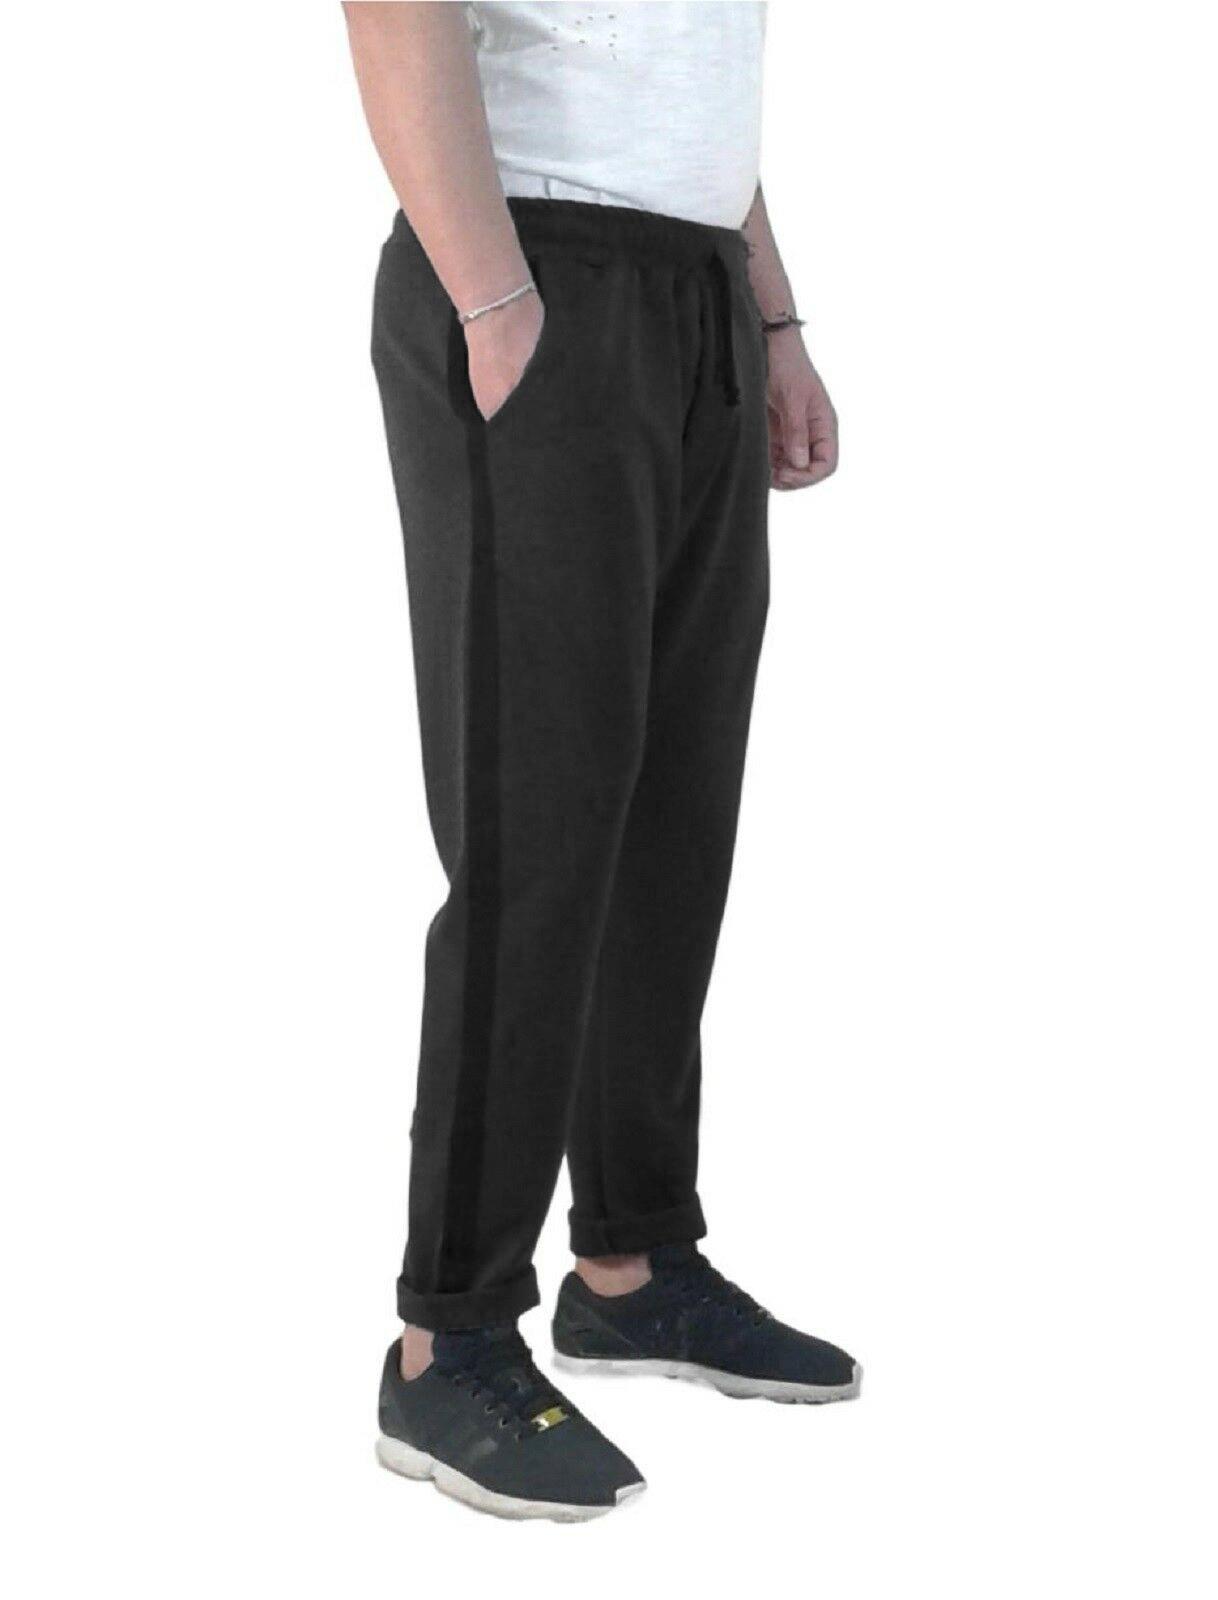 Pantalone-Tuta-Uomo-Sportivo-Fitness-Basic-Casual-Elastico-in-Vita-Slim-Fit miniatura 7